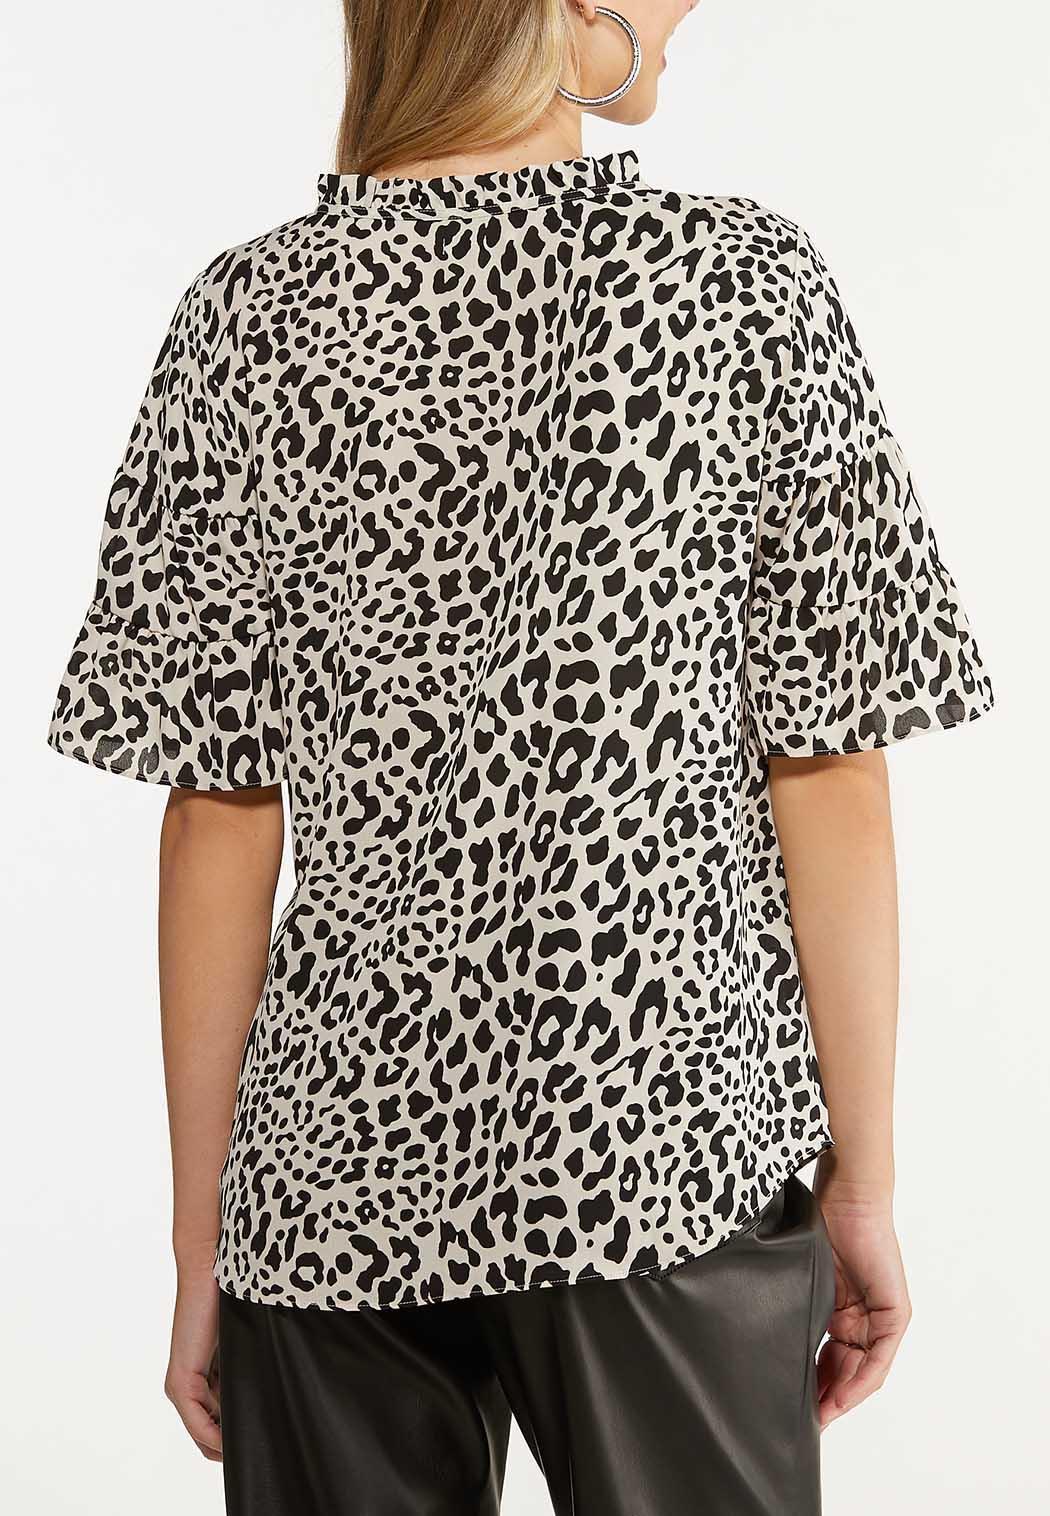 Leopard Tiered Sleeve Top (Item #44653716)